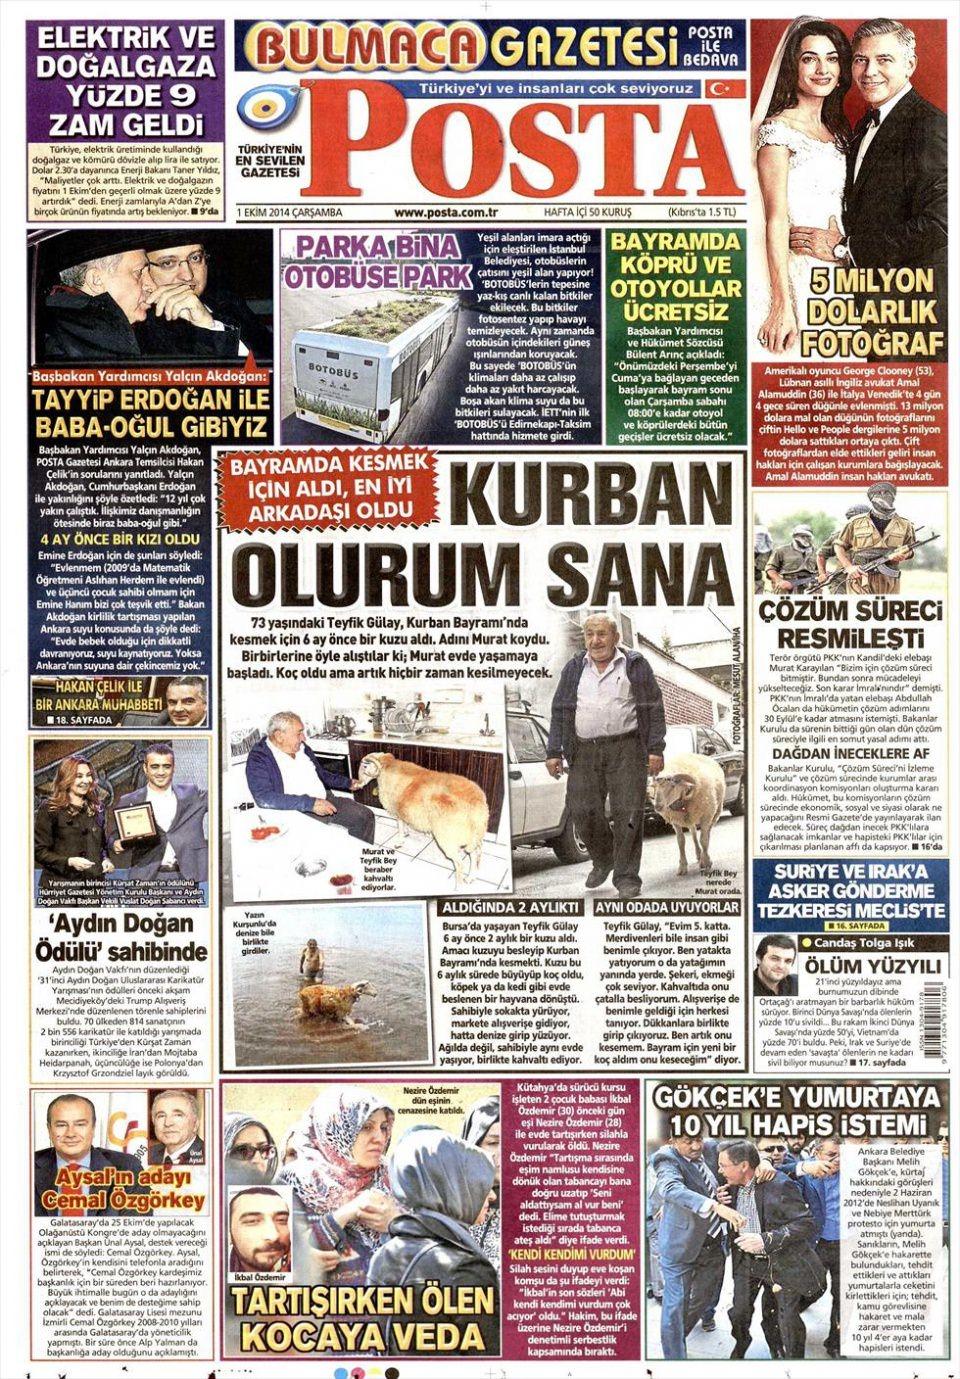 1 Ekim 2014 gazete manşetleri 14